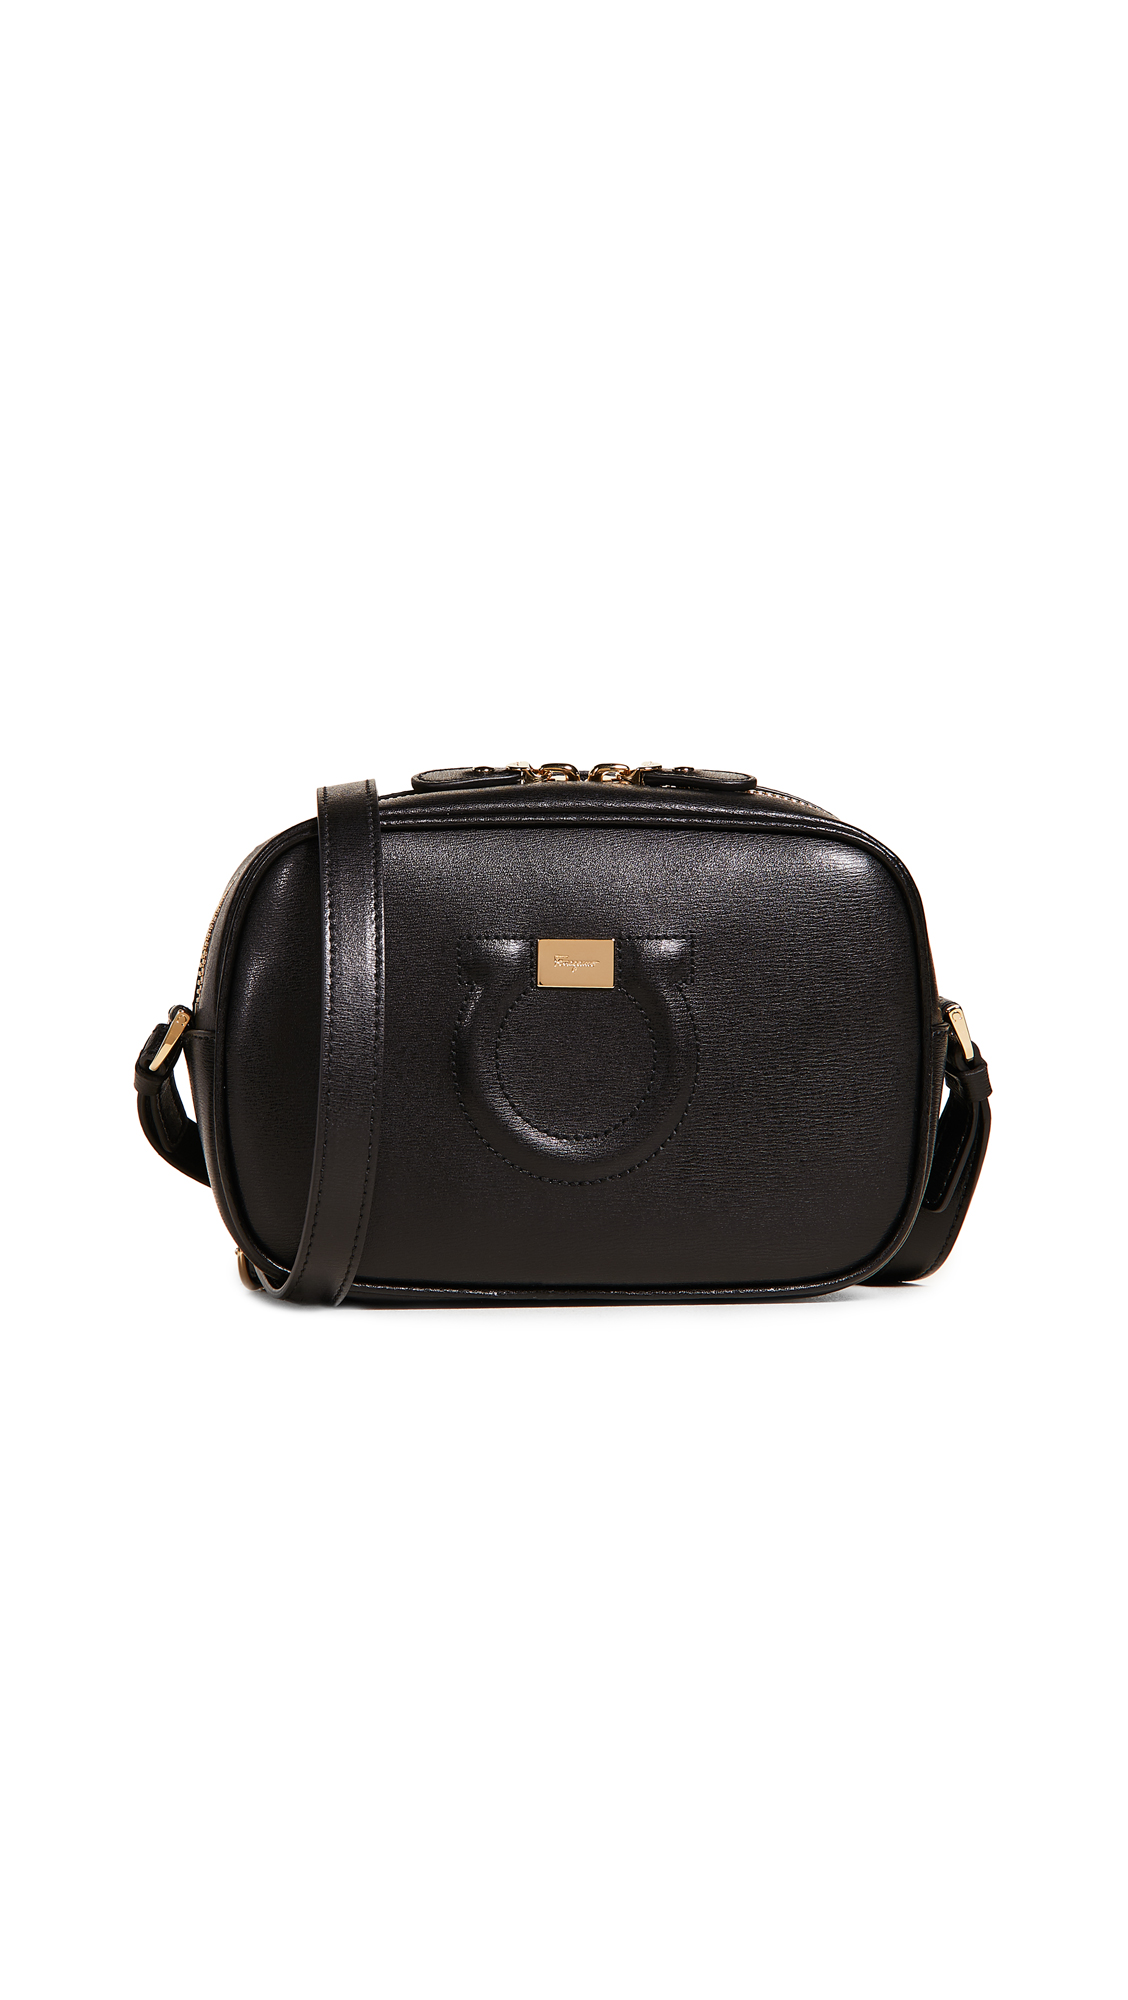 Salvatore Ferragamo City Camera Bag